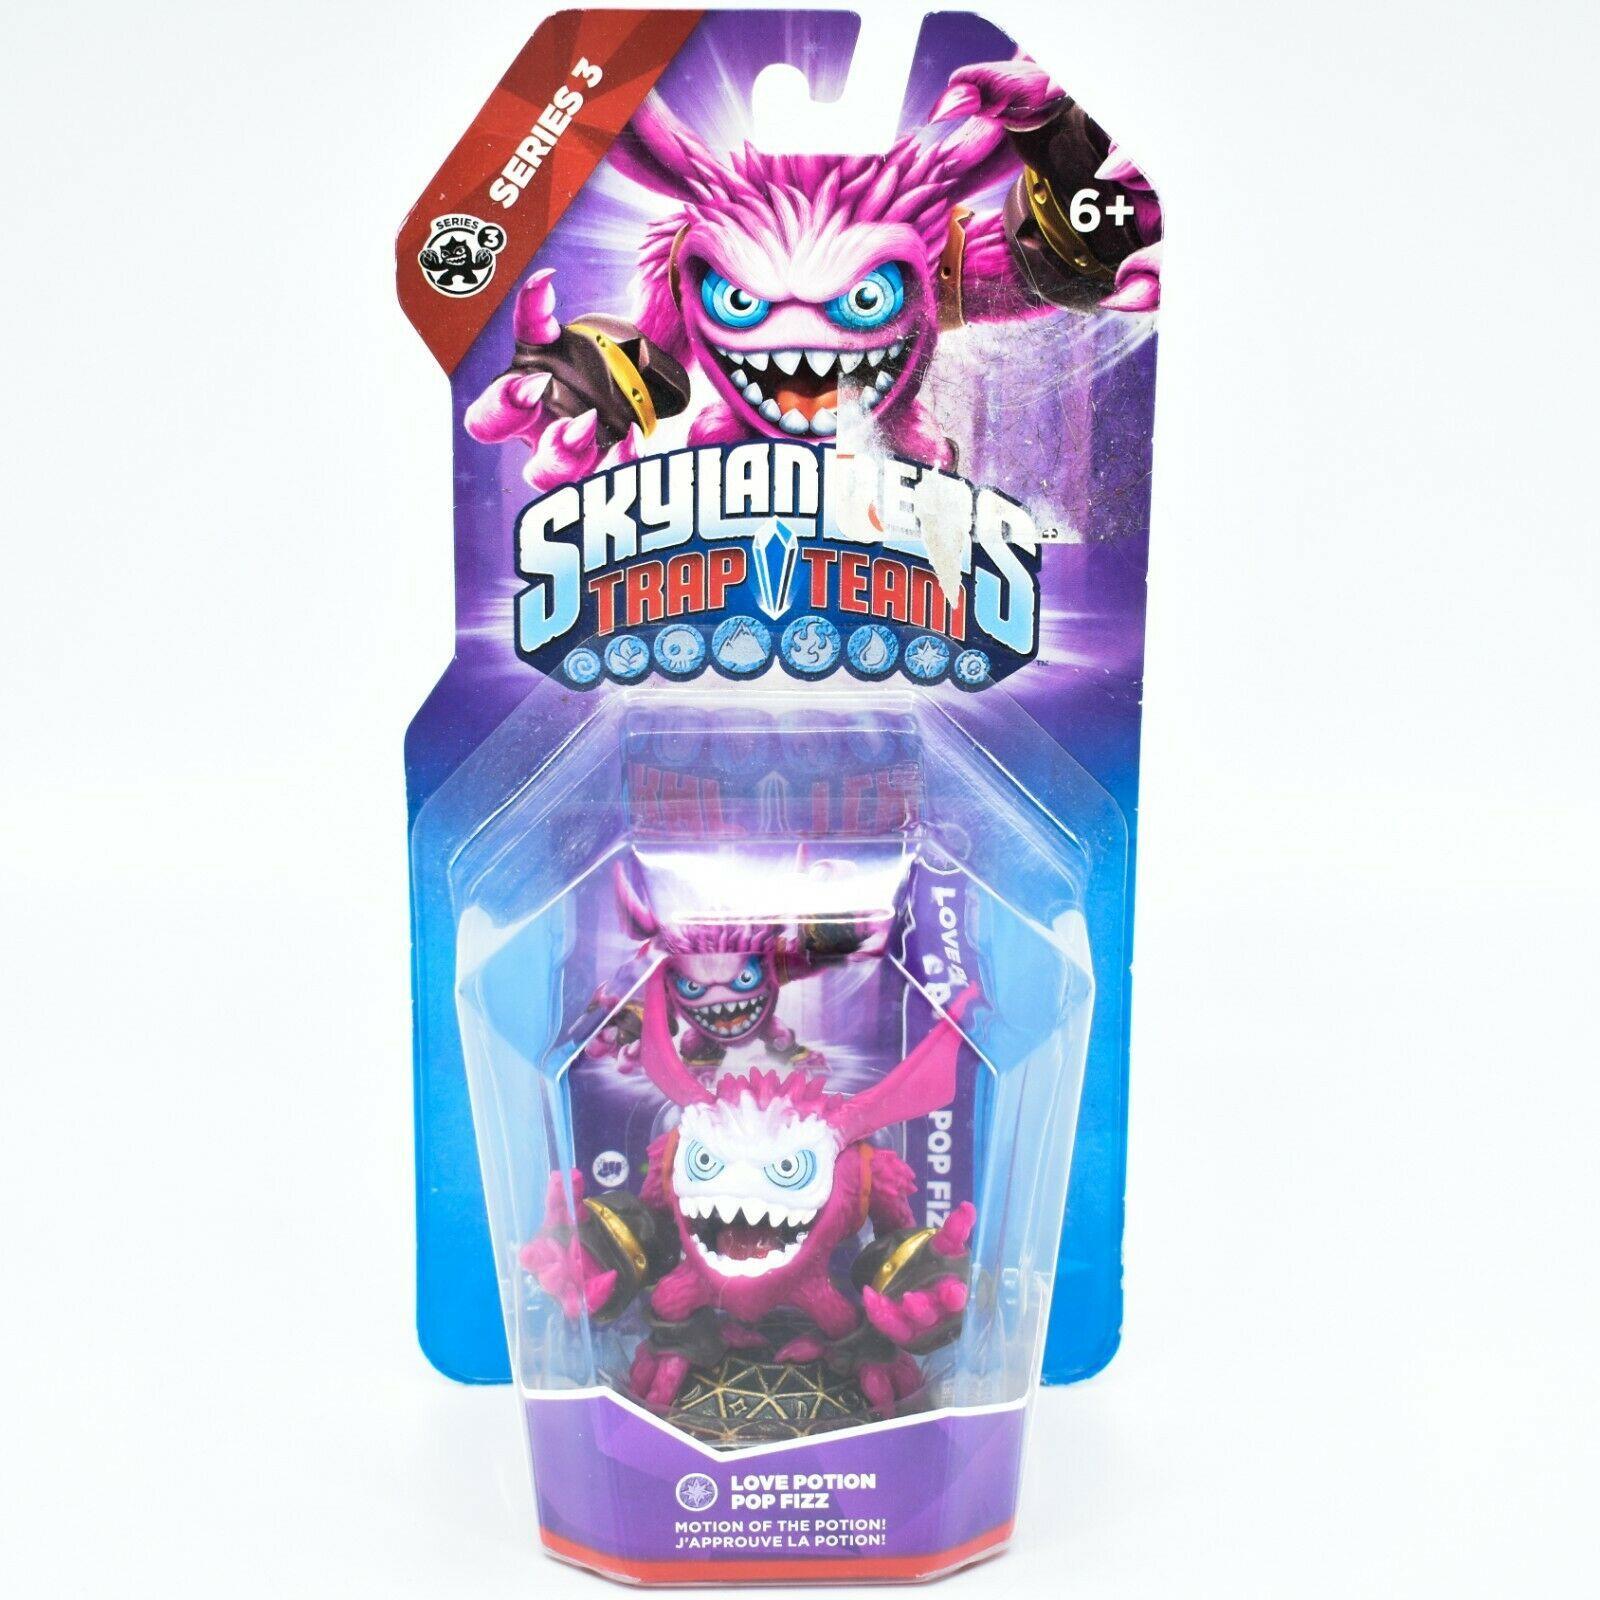 Activision Skylanders Trap Team Love Potion Pop Fizz Magic Series 3 Character